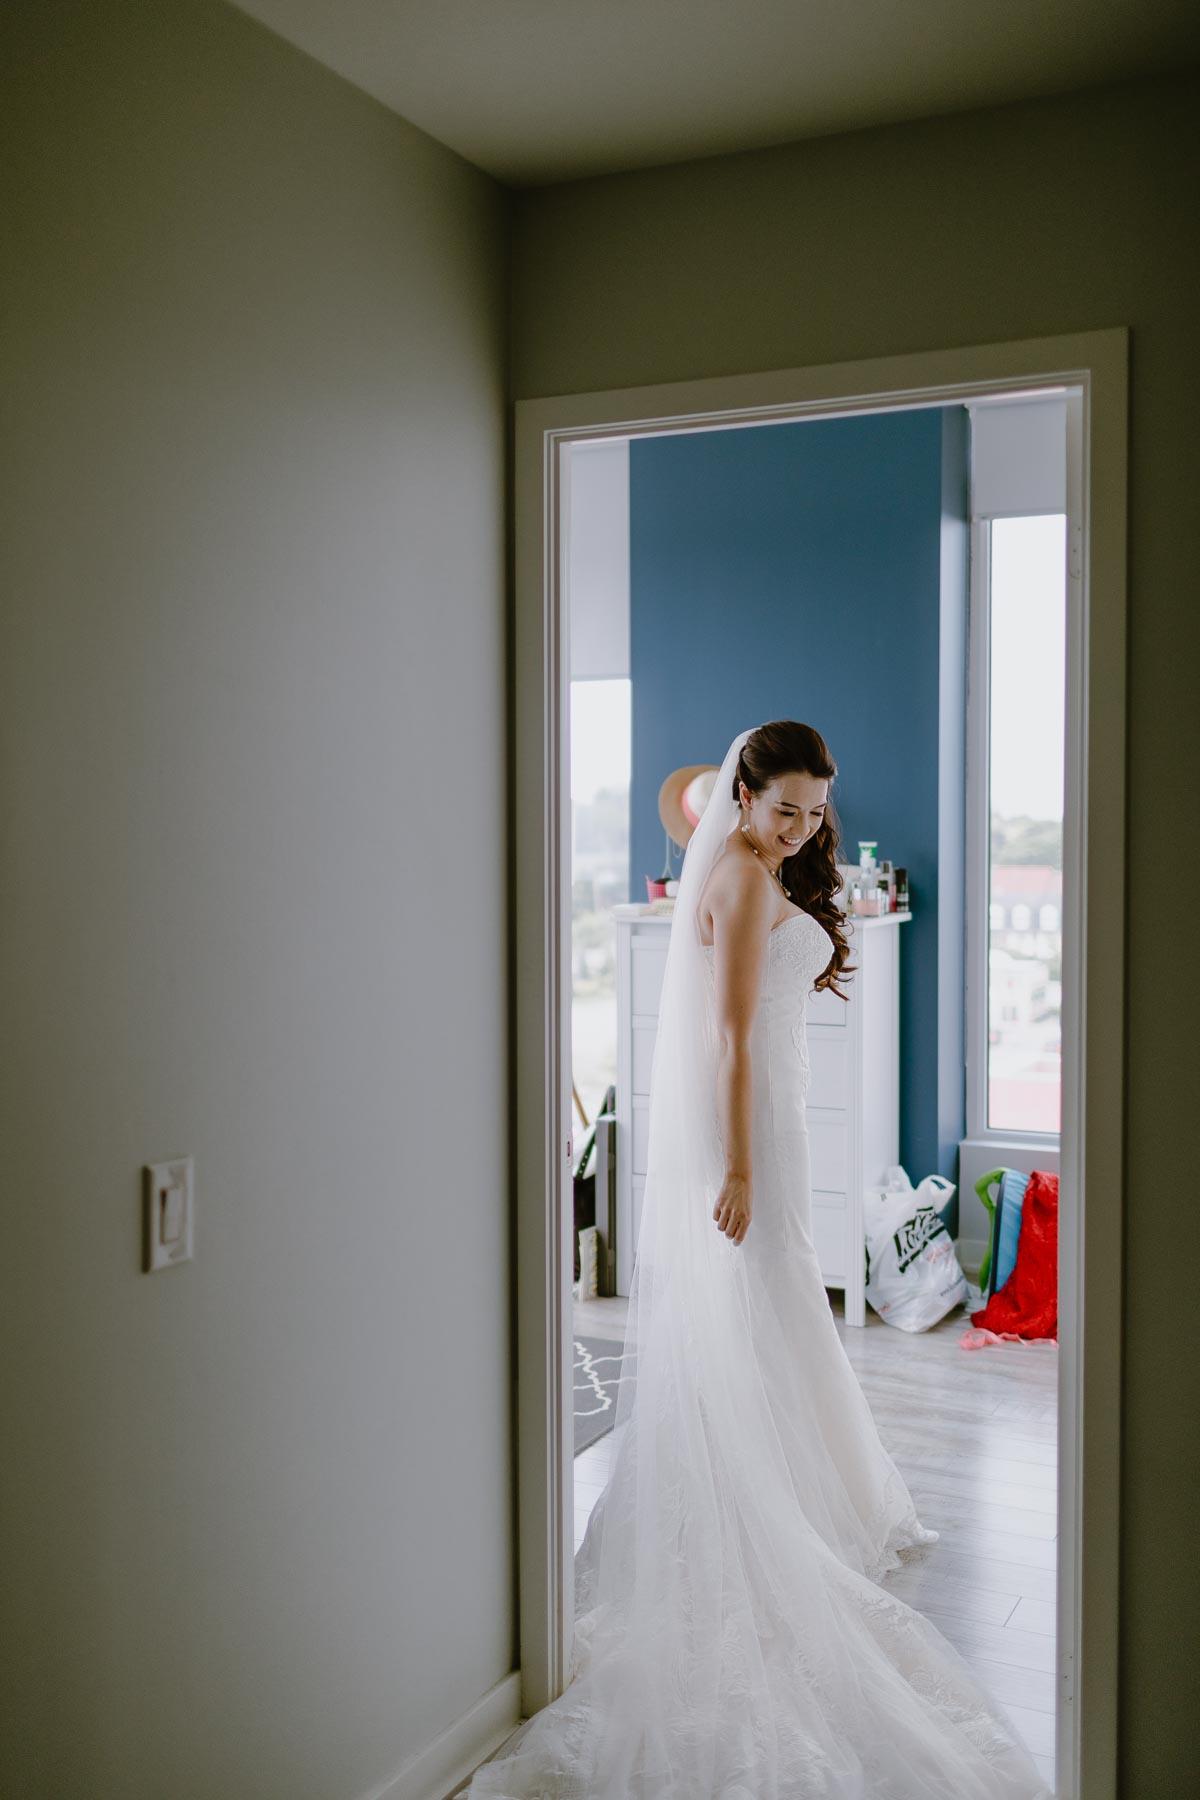 hilton-markham-wedding-toronto-chinese-wedding 0017.jpg